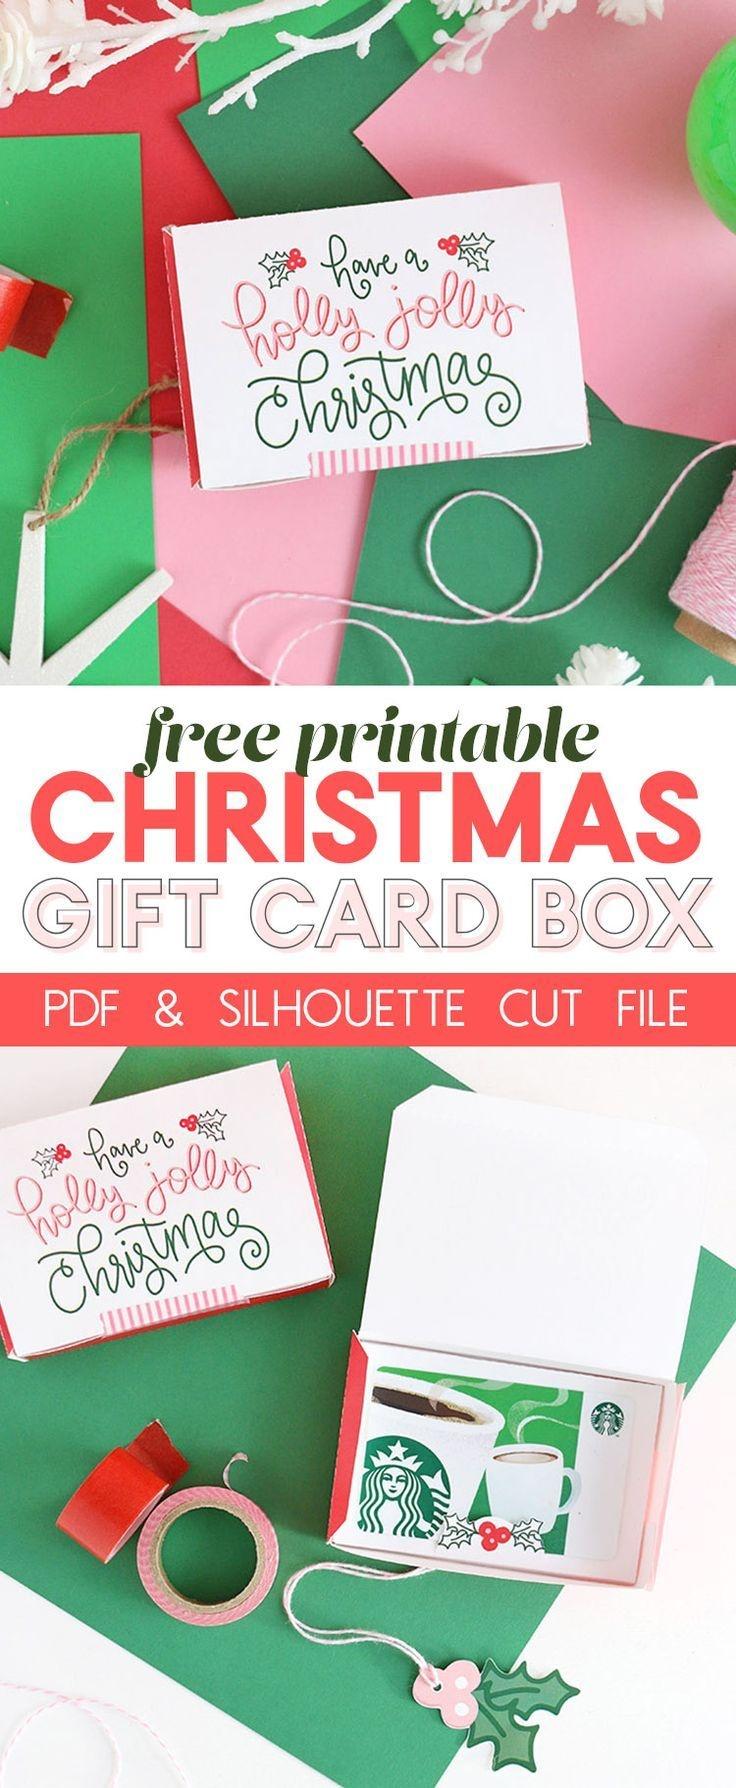 Diy Gift Card Box - Free Printable Gift Idea For Christmas   Persia - Free Printable Christmas Gift Cards